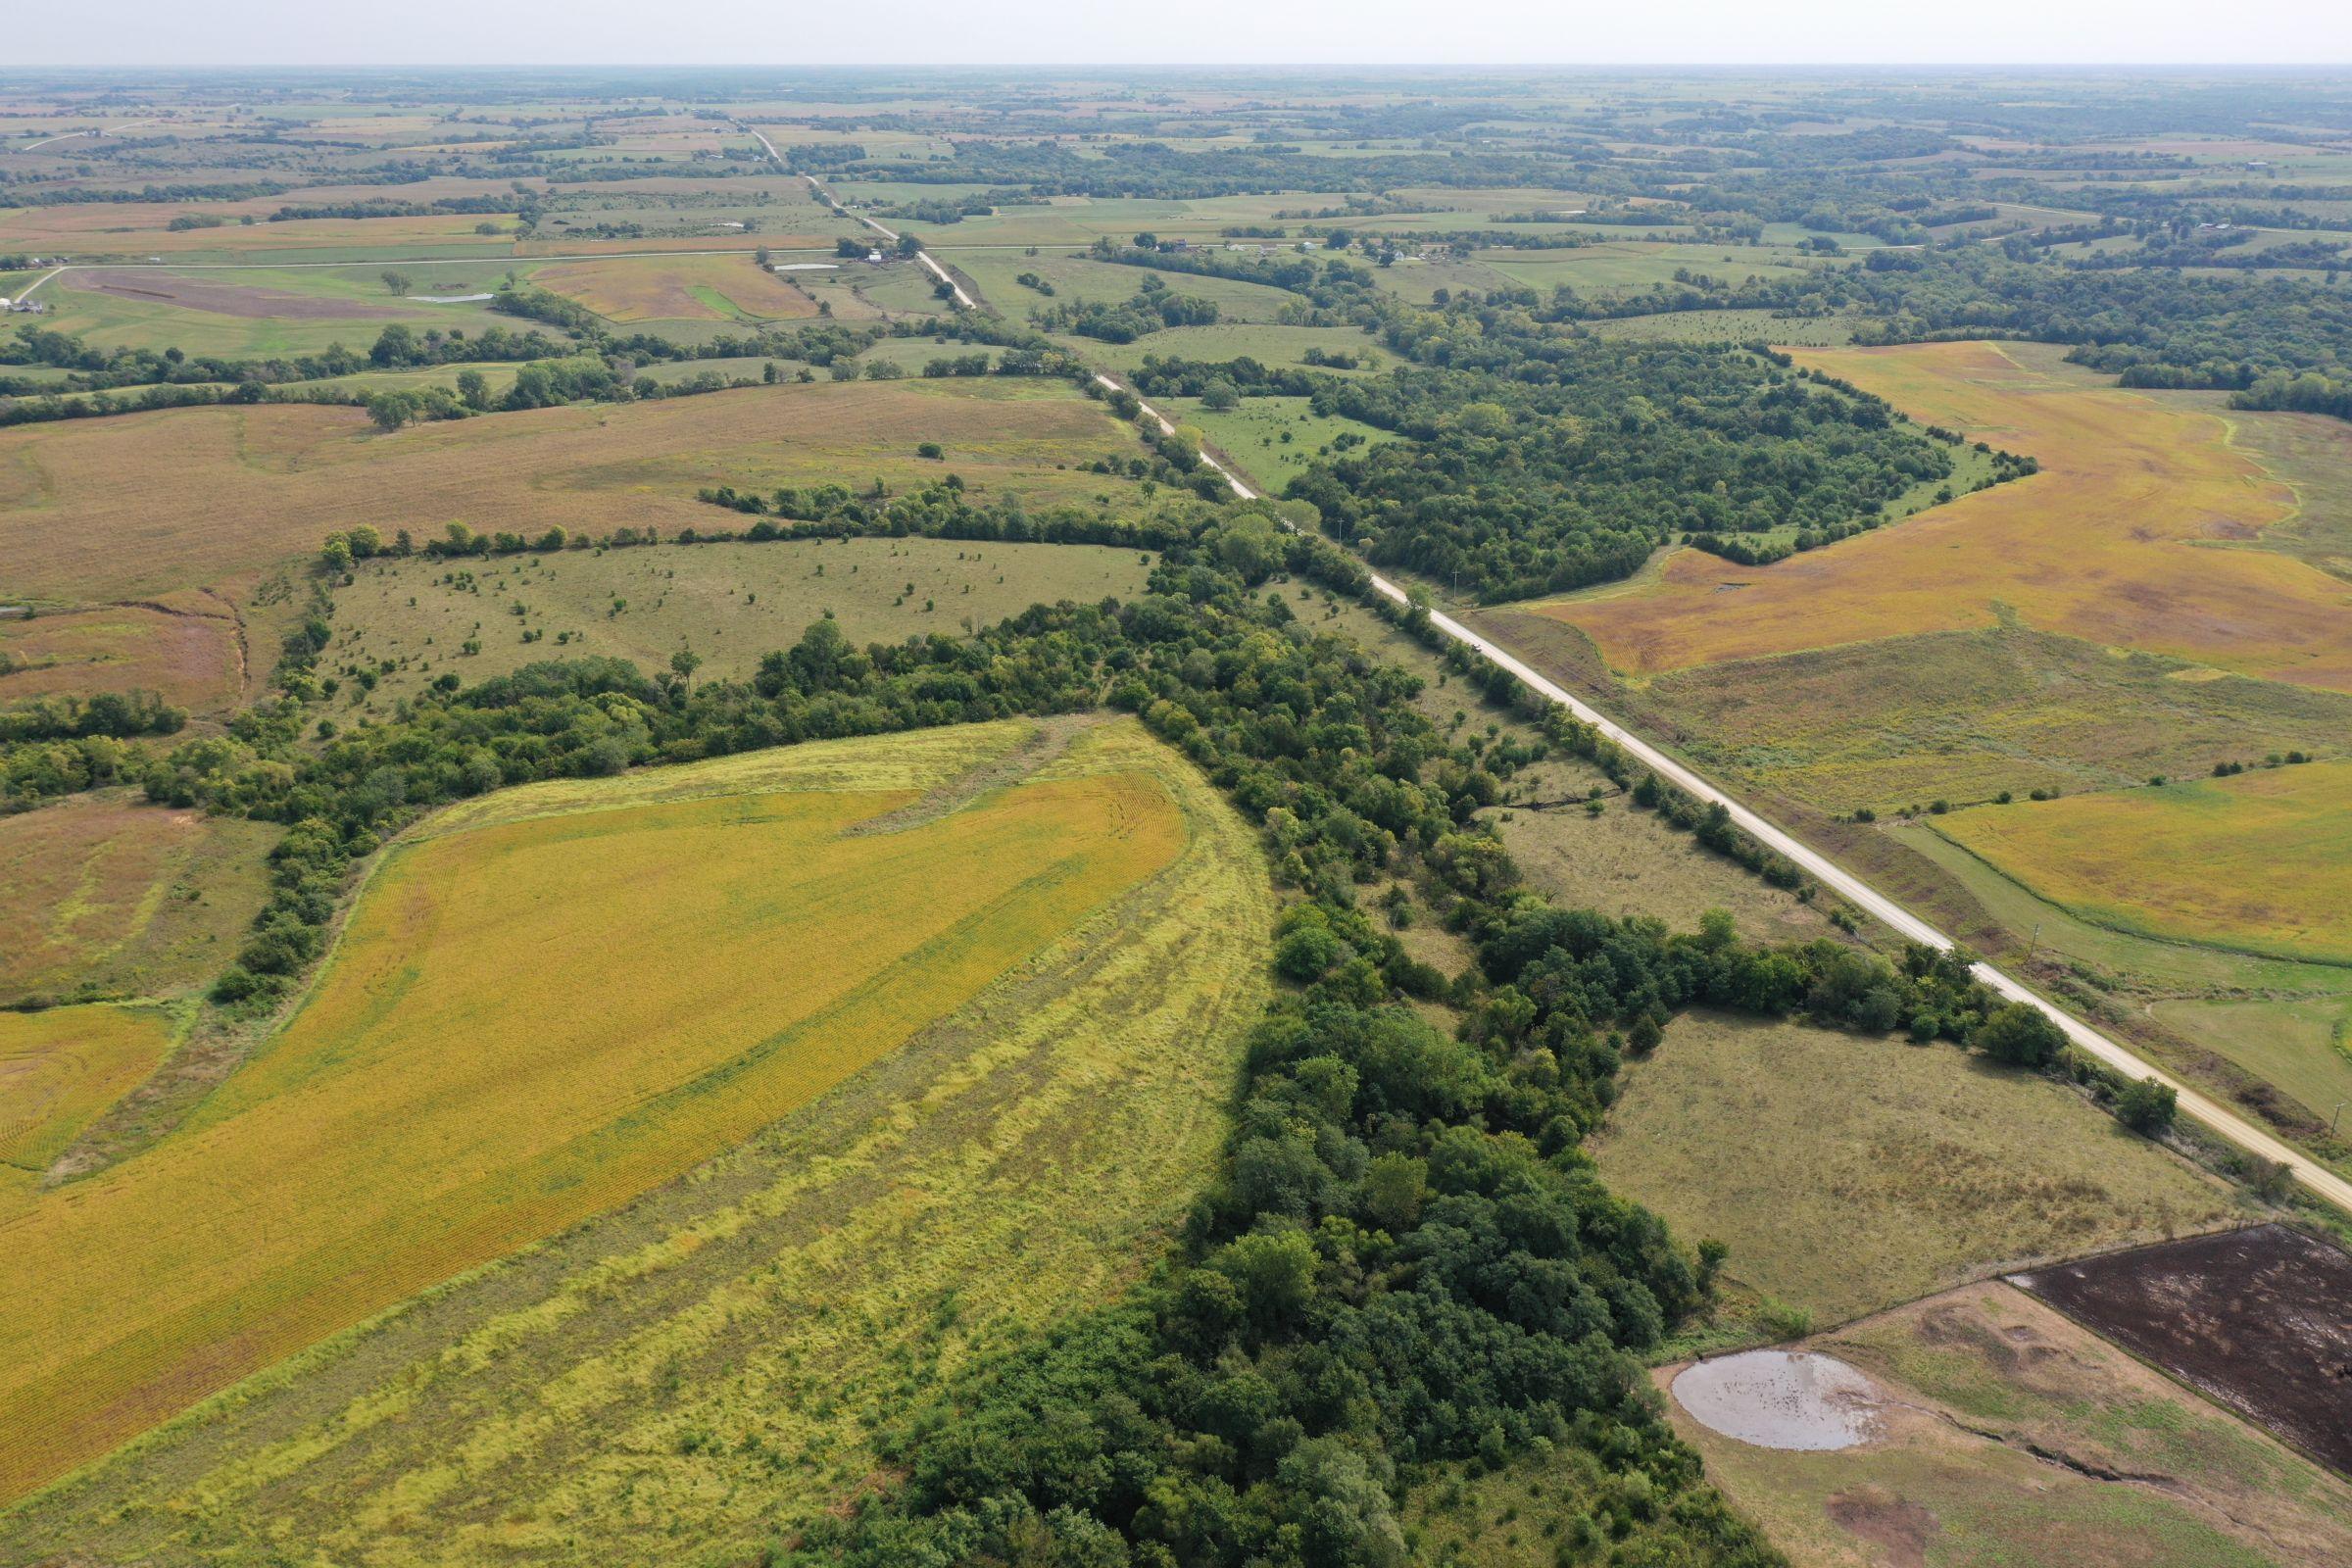 clarke-county-iowa-37-acres-listing-number-15398-4-2021-03-08-151452.jpg